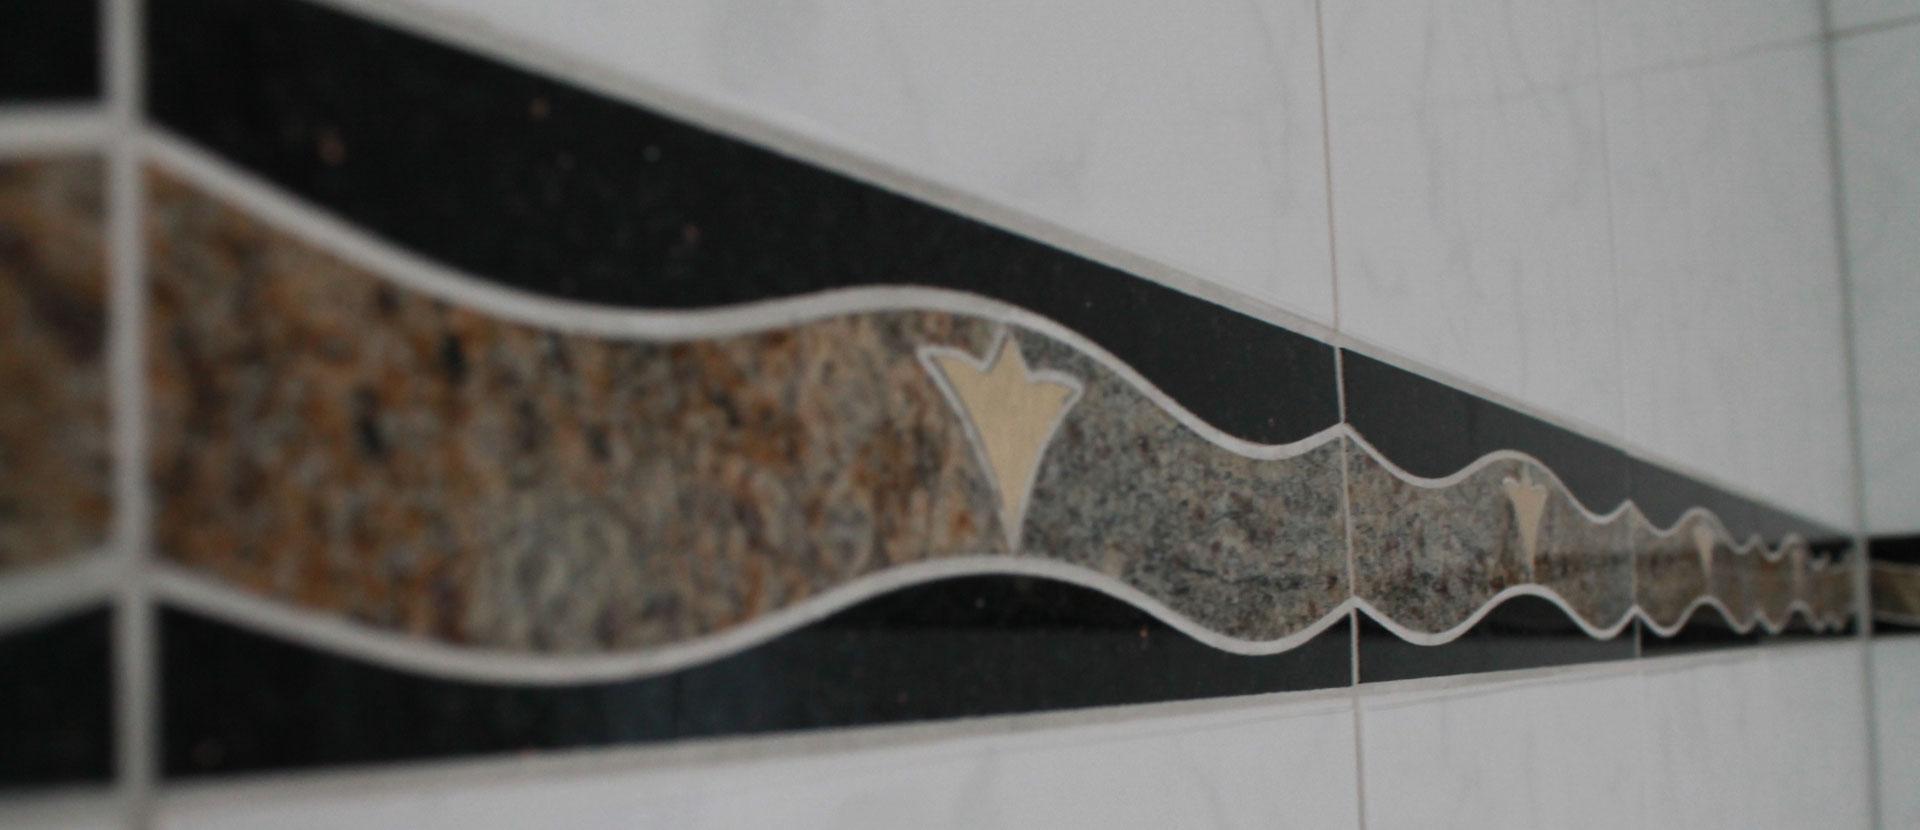 alexander neif mit liebe zum detail fliesenleger krefeld. Black Bedroom Furniture Sets. Home Design Ideas